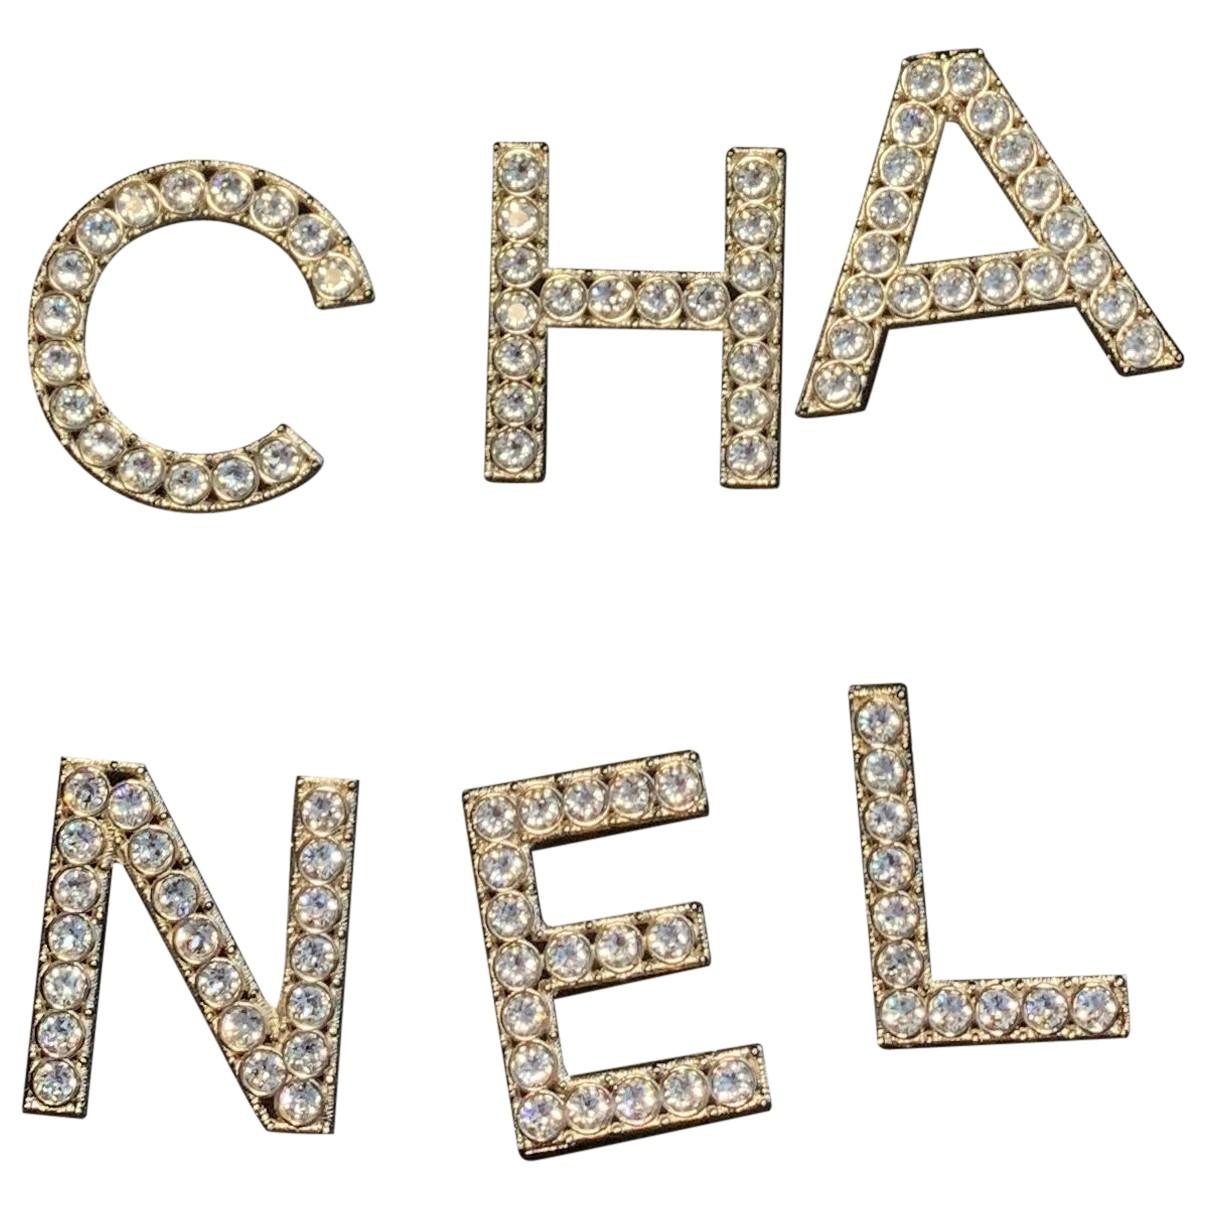 Broche CHANEL en Metal Plateado Chanel